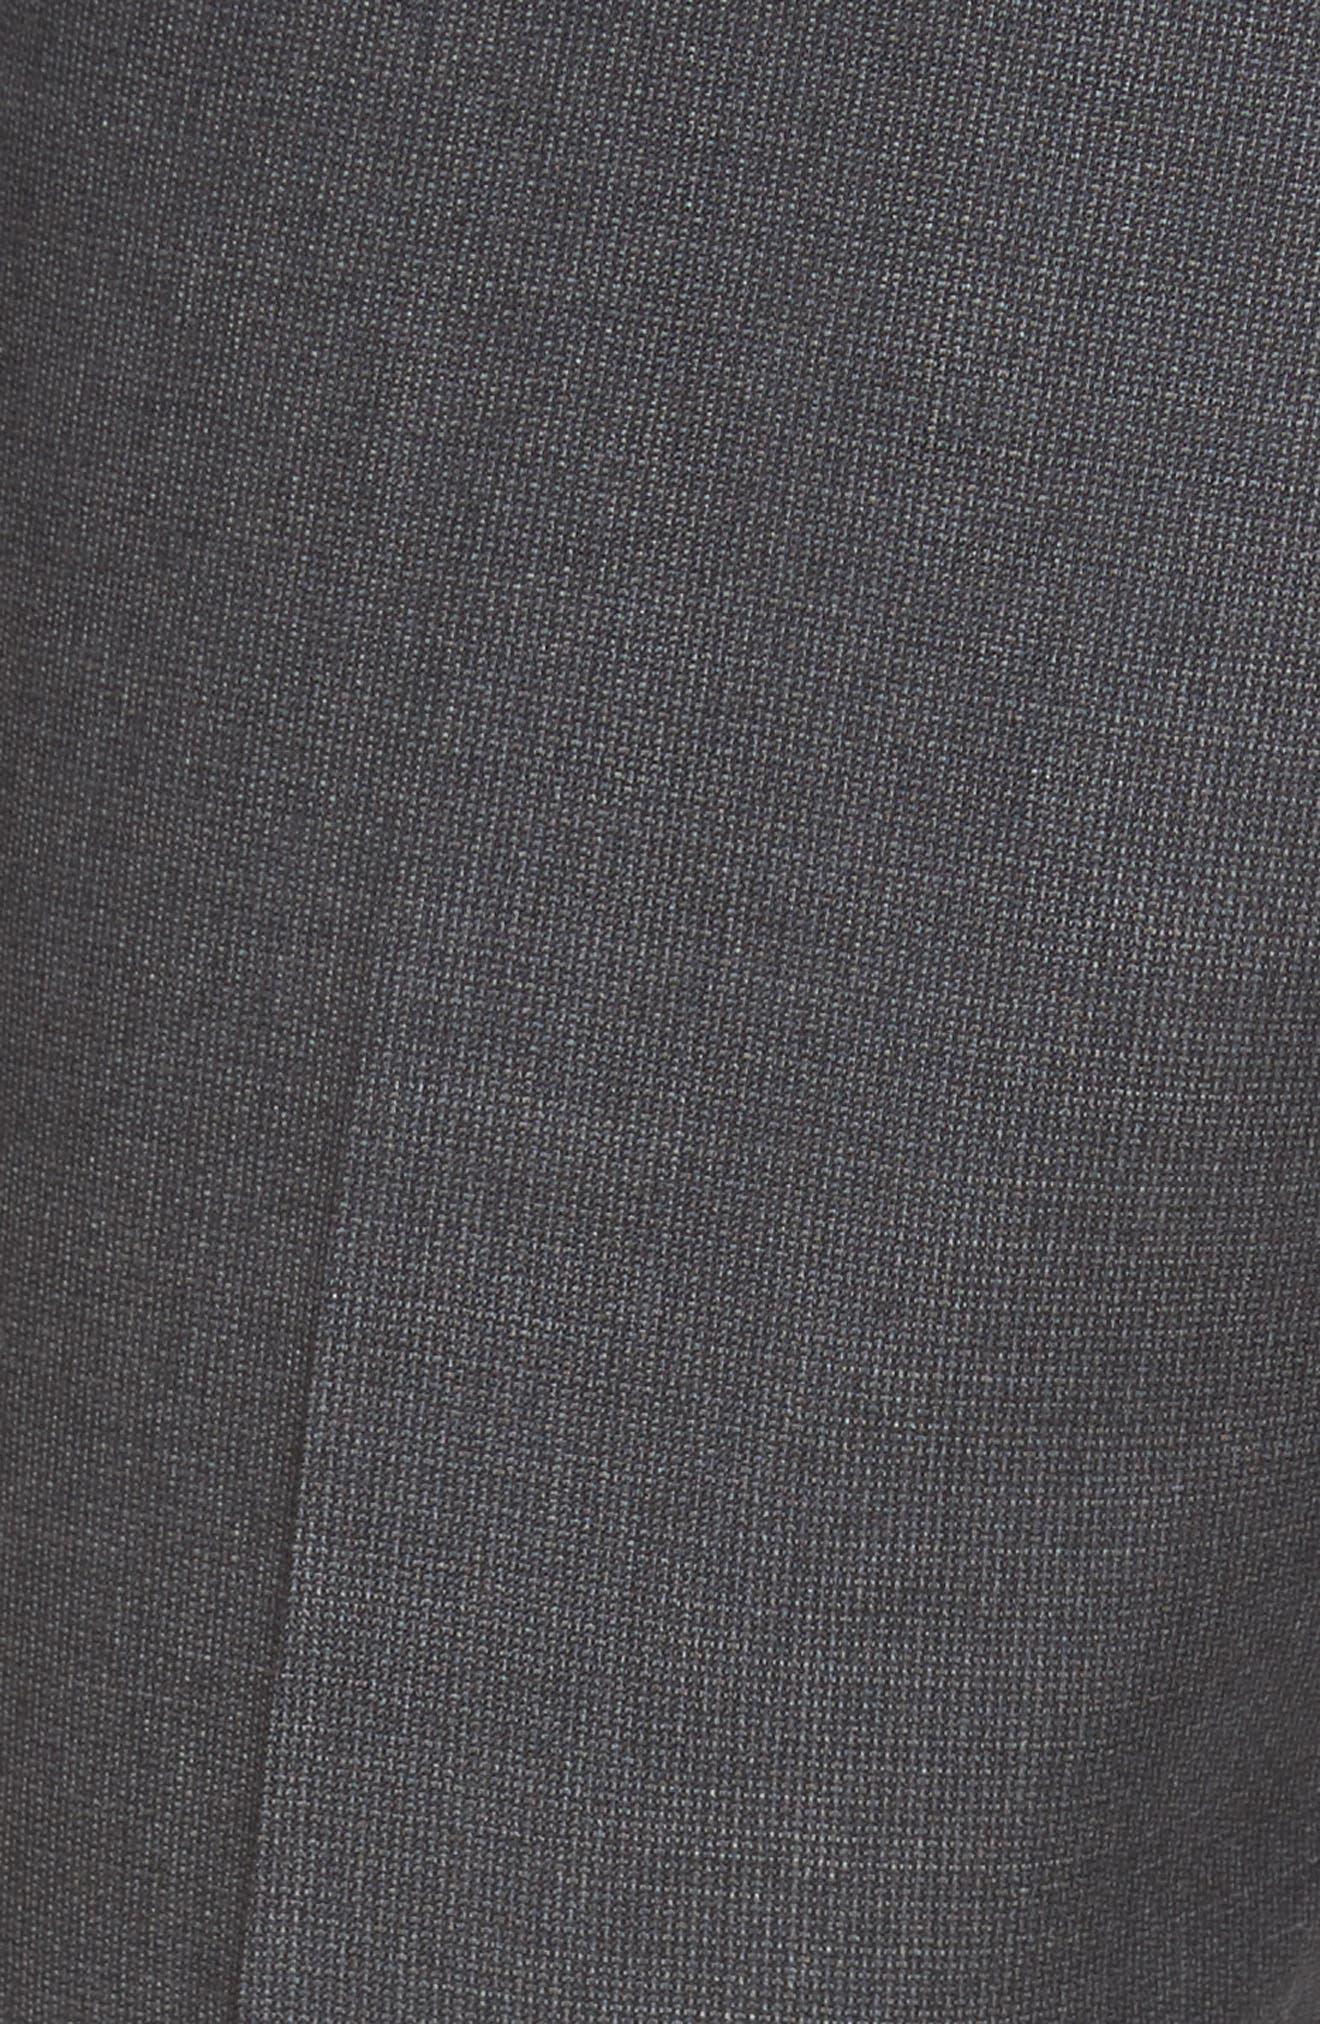 Alternate Image 5  - Nordstrom Men's Shop Flat Front Solid Wool Suit Trousers